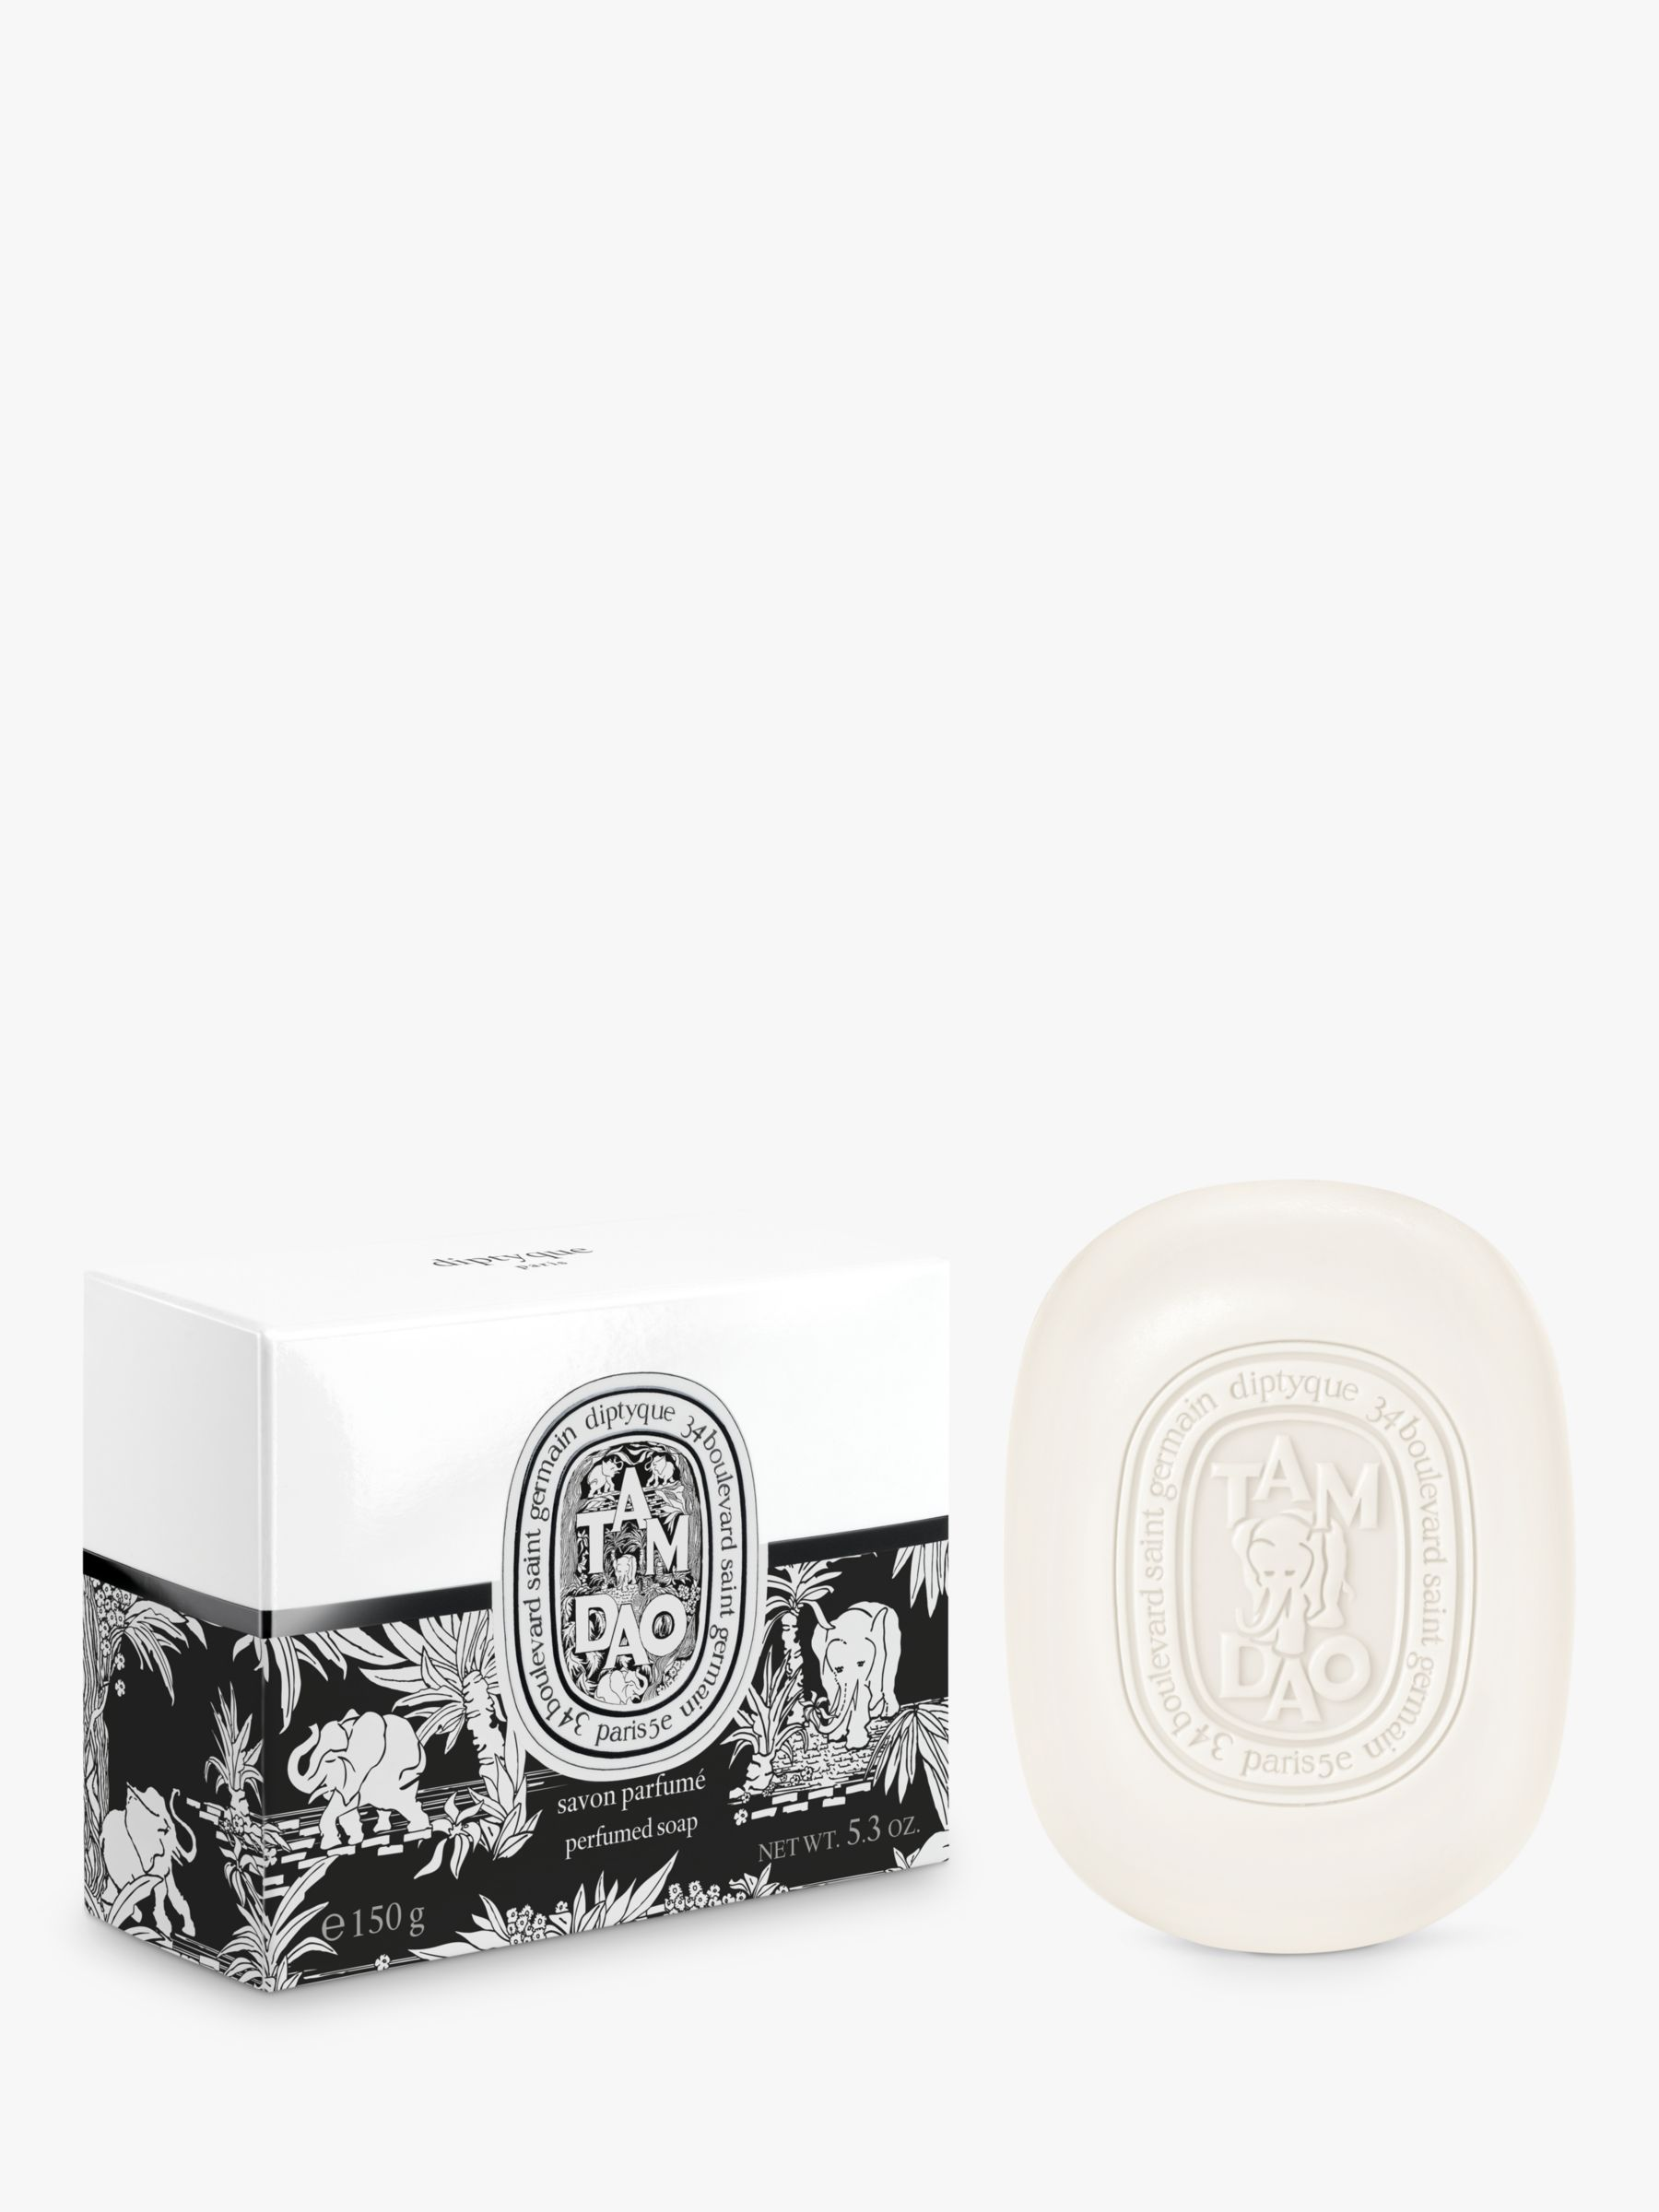 Diptyque Diptyque Tam Dao Soap, 150g